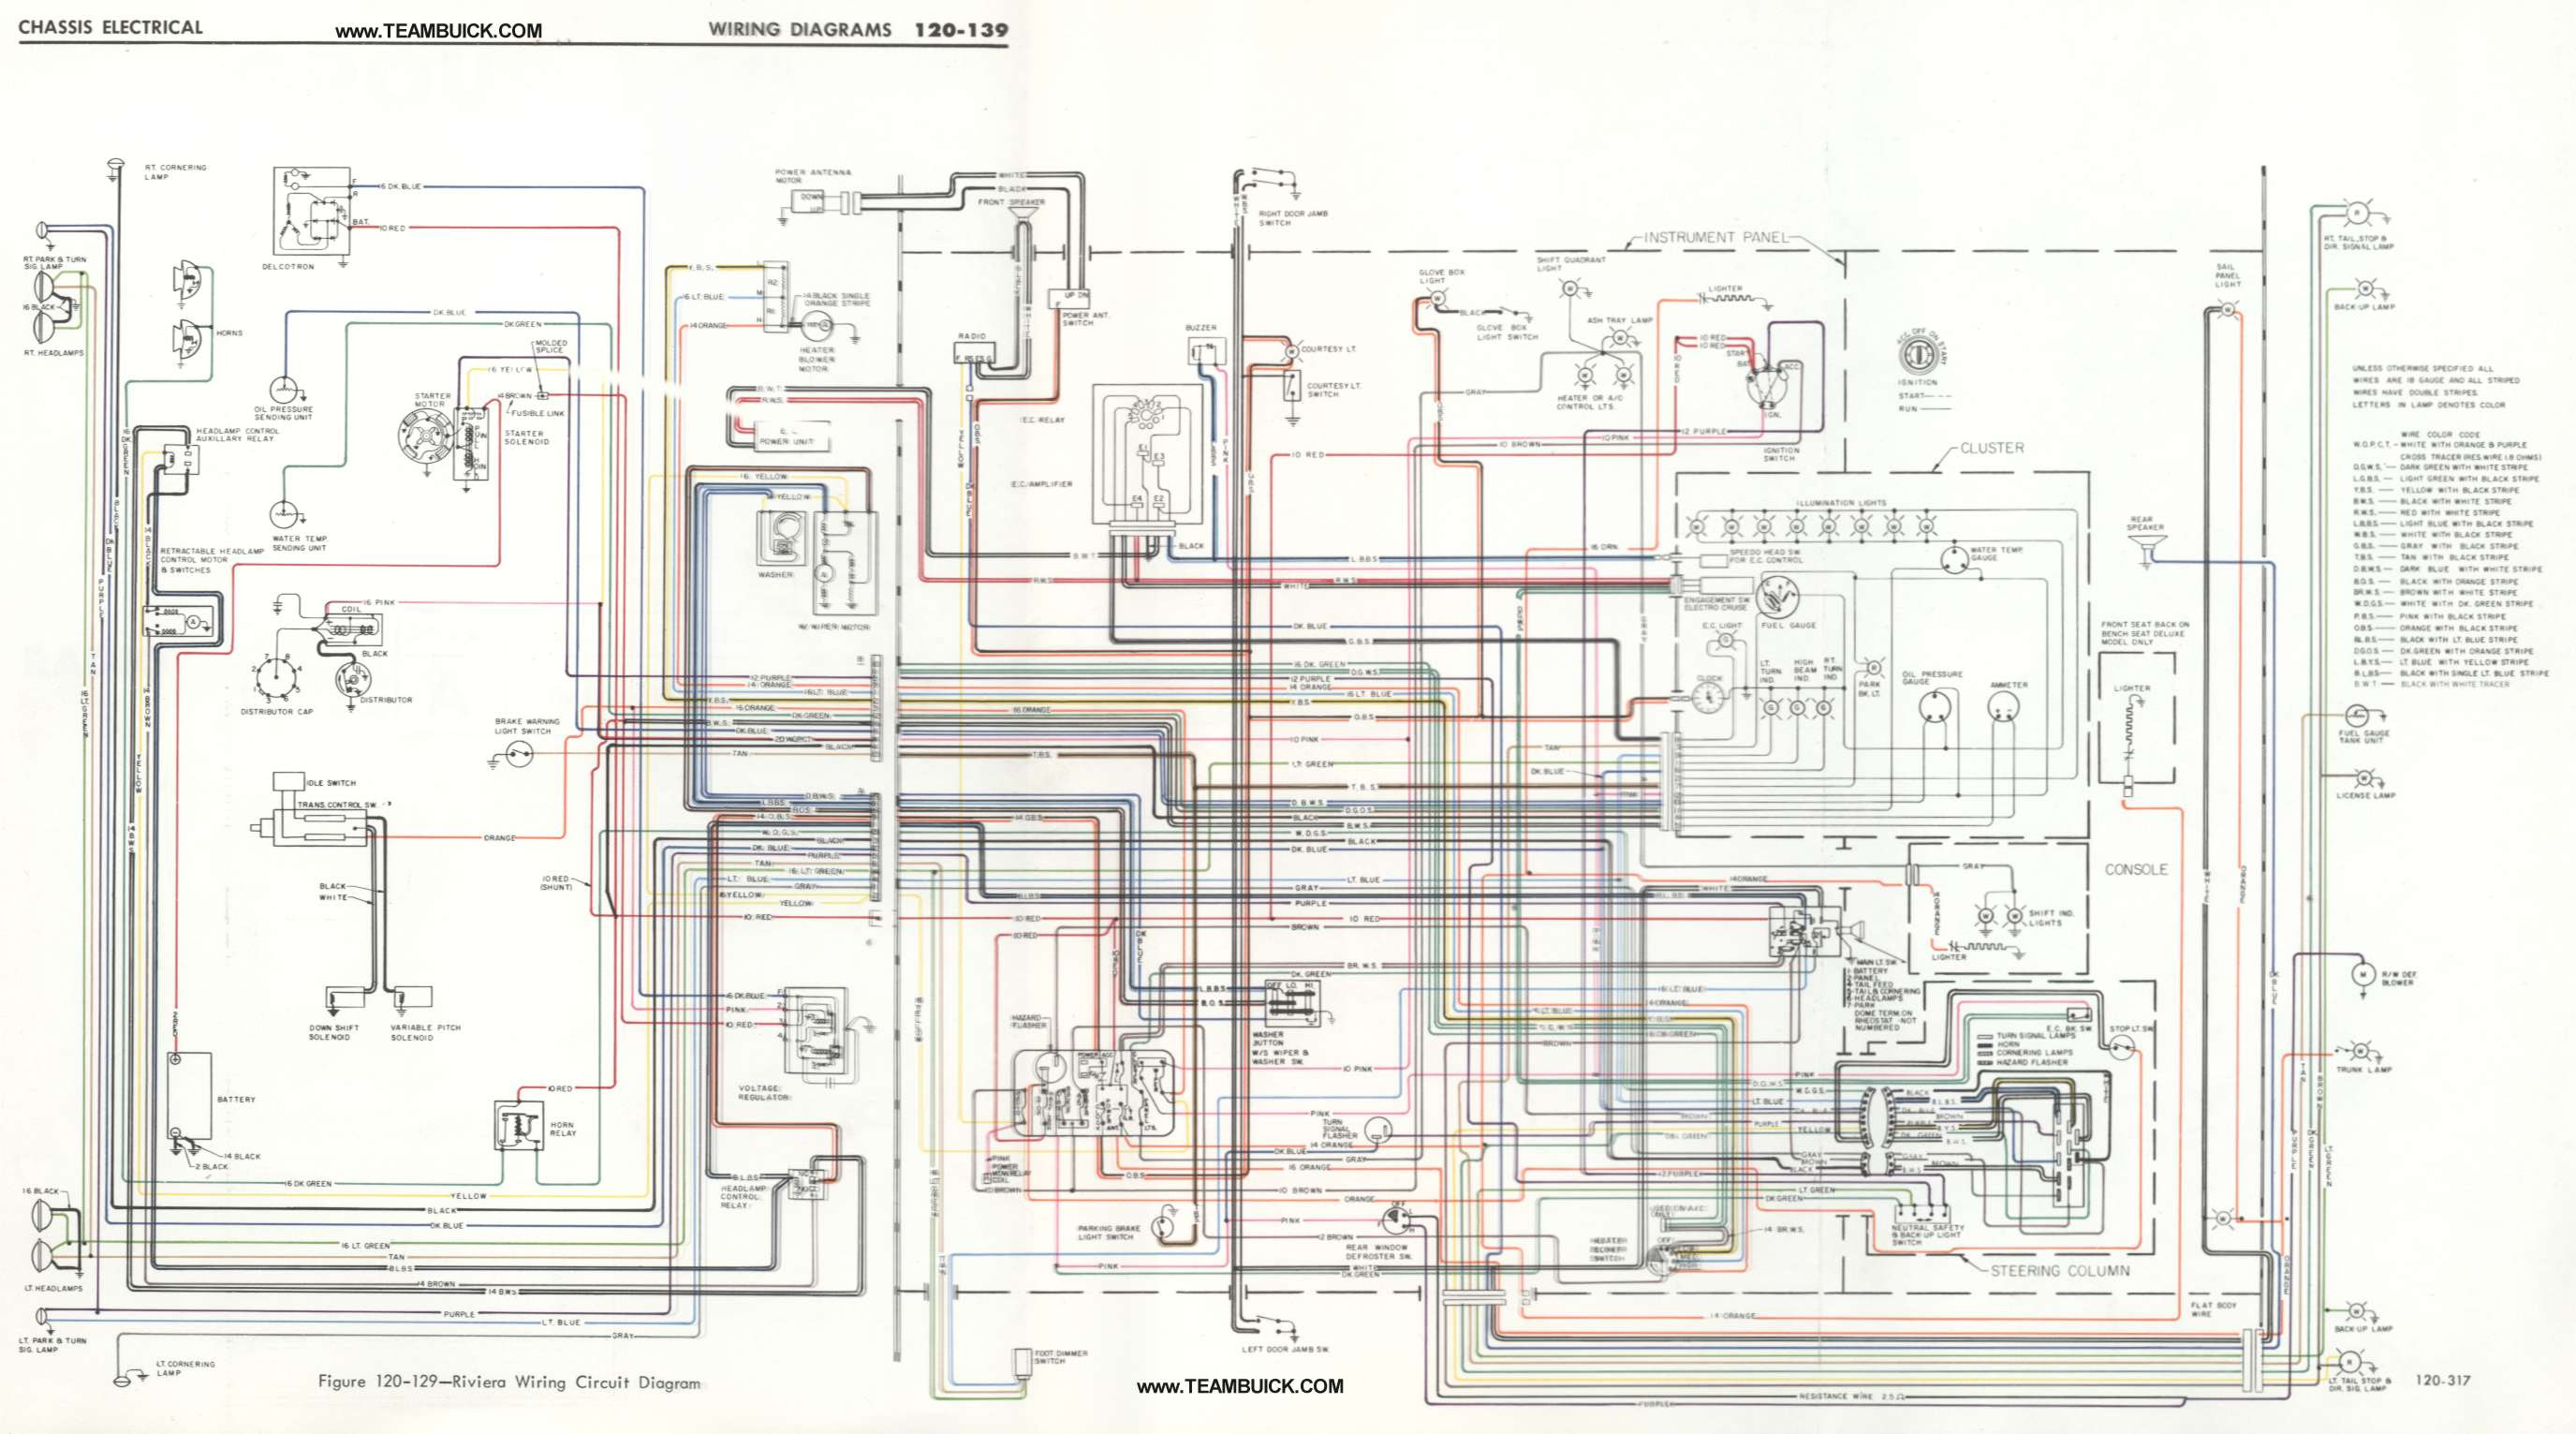 34 1997 Buick Lesabre Fuse Box Diagram - Wiring Diagram ...